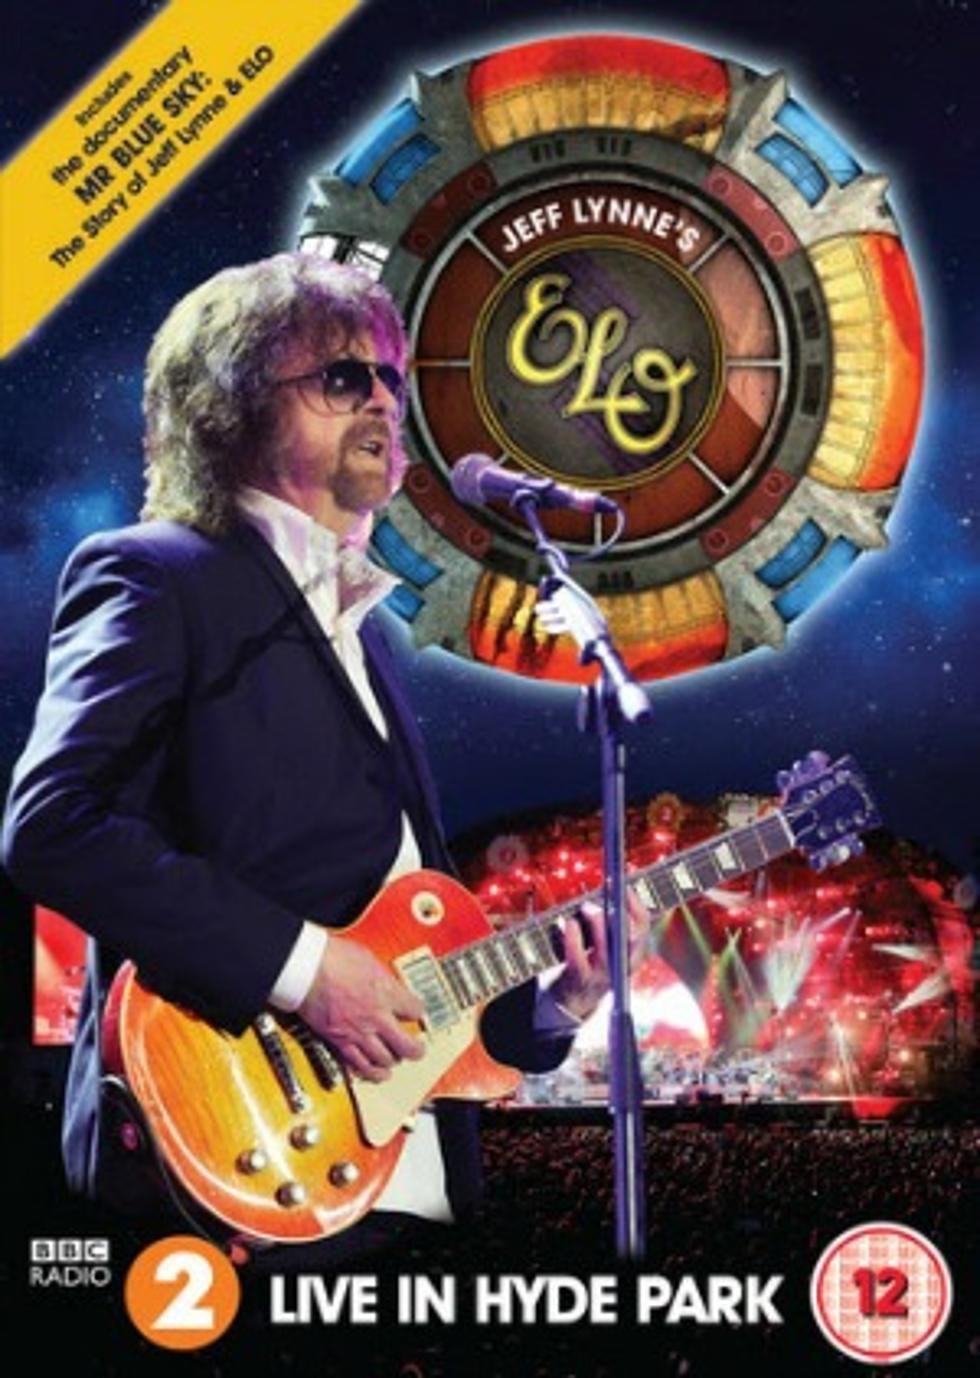 Jeff Lynne's ELO Announce 'Live in Hyde Park' Concert Film